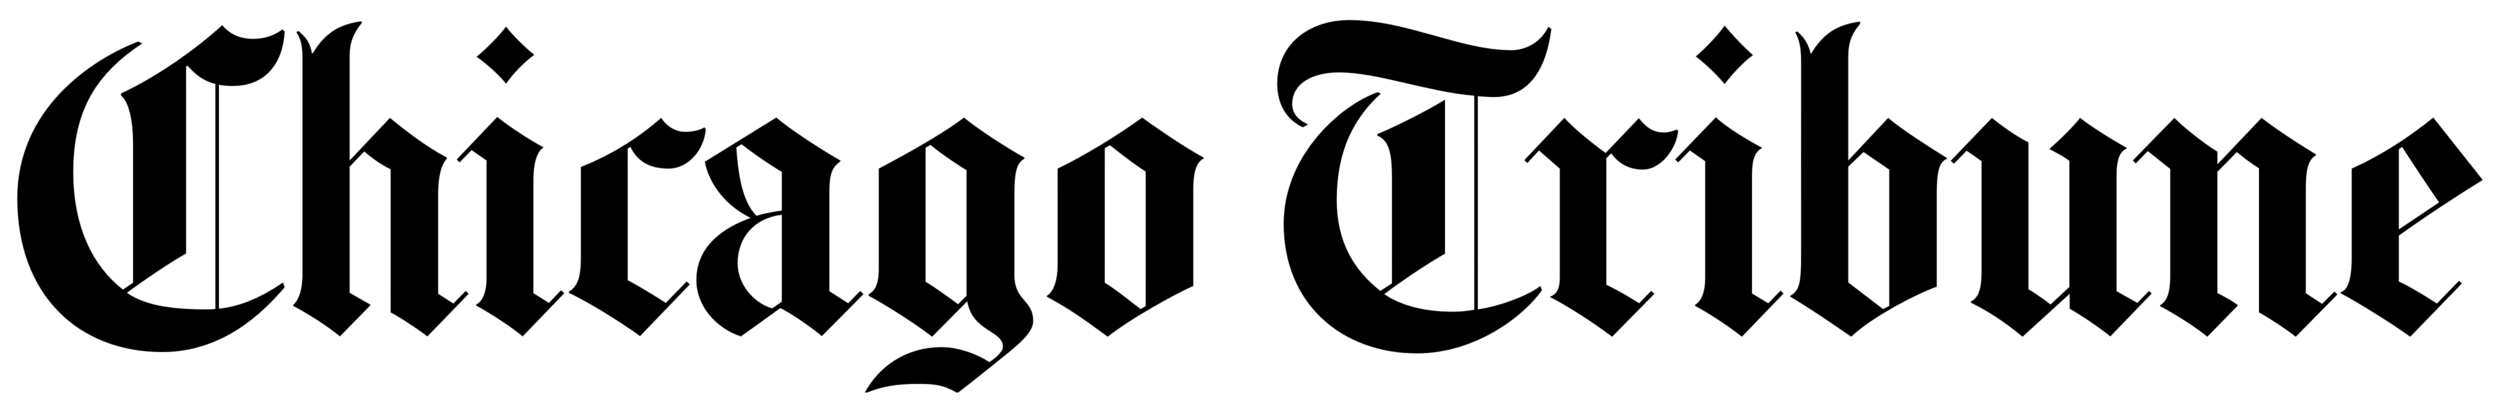 Chicago_Tribune_logo_black-1.png